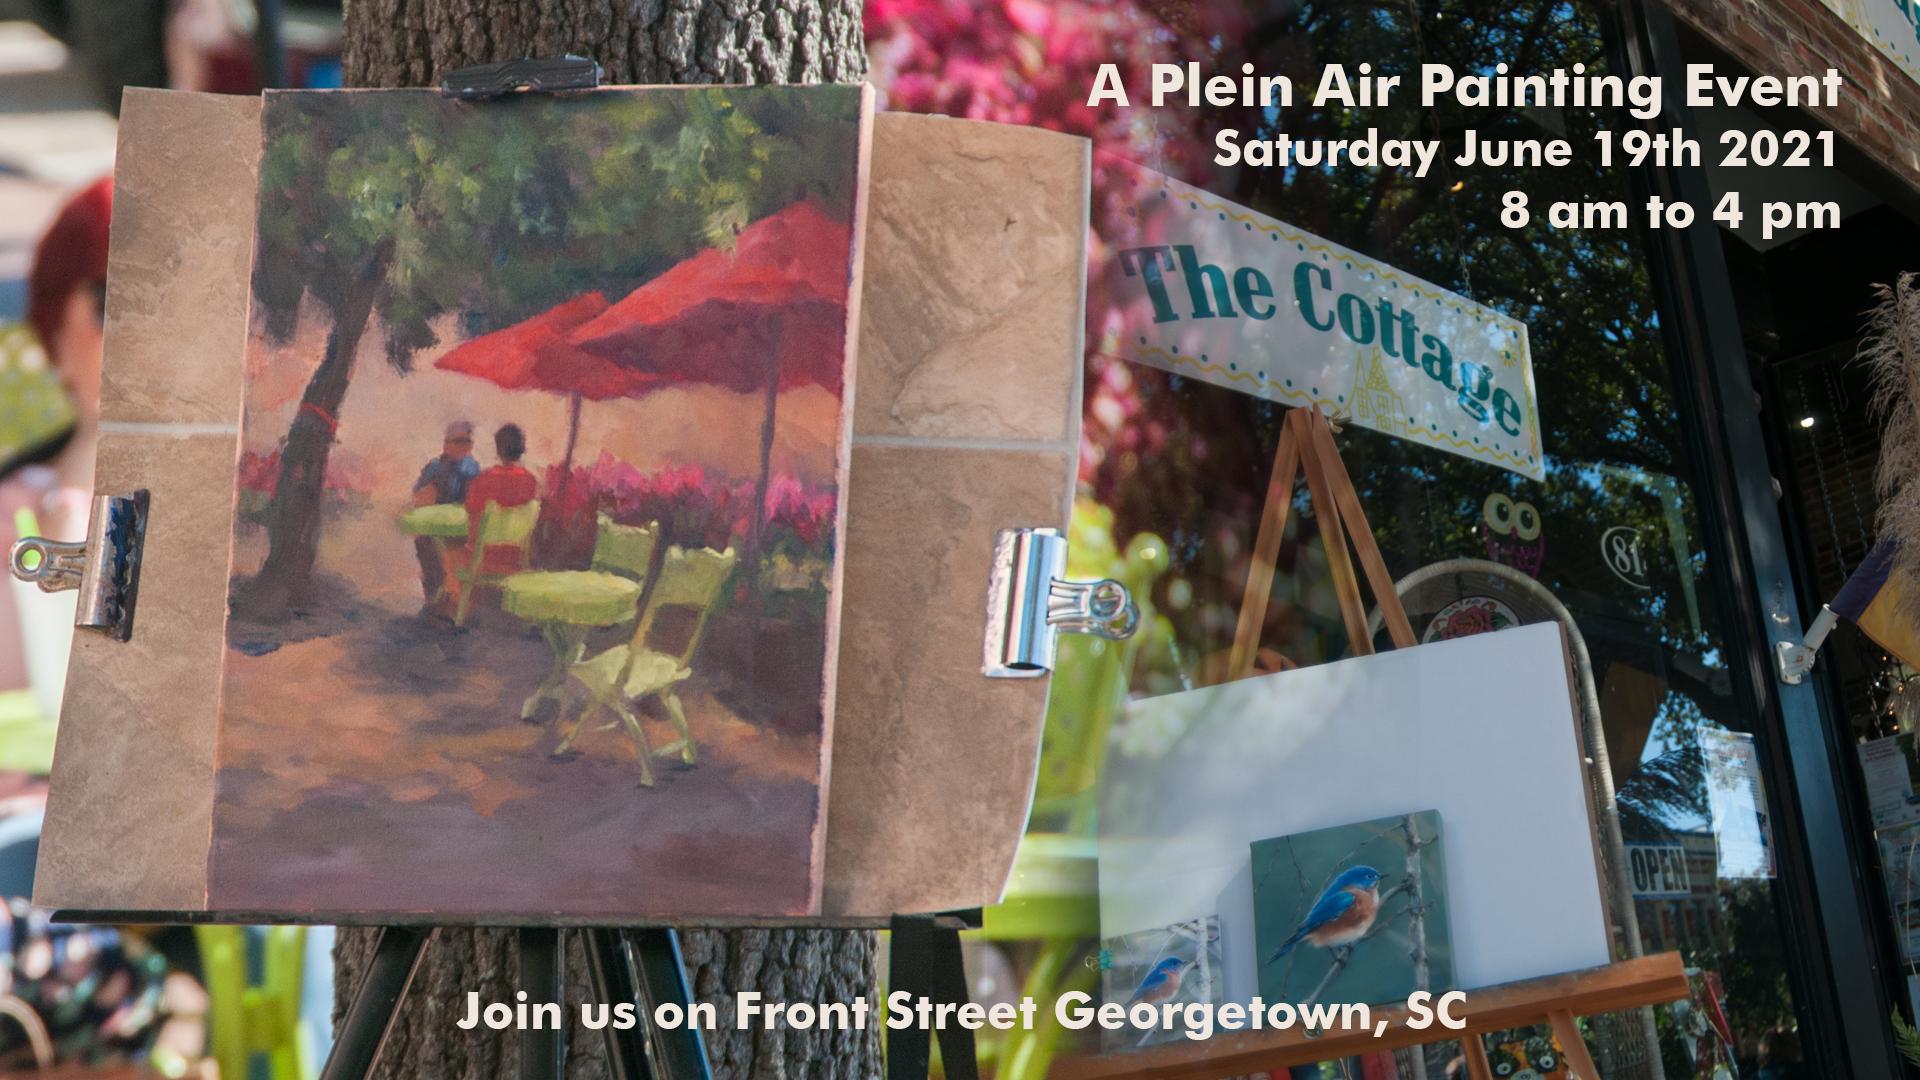 plein-air painting event -Georgetown, SC